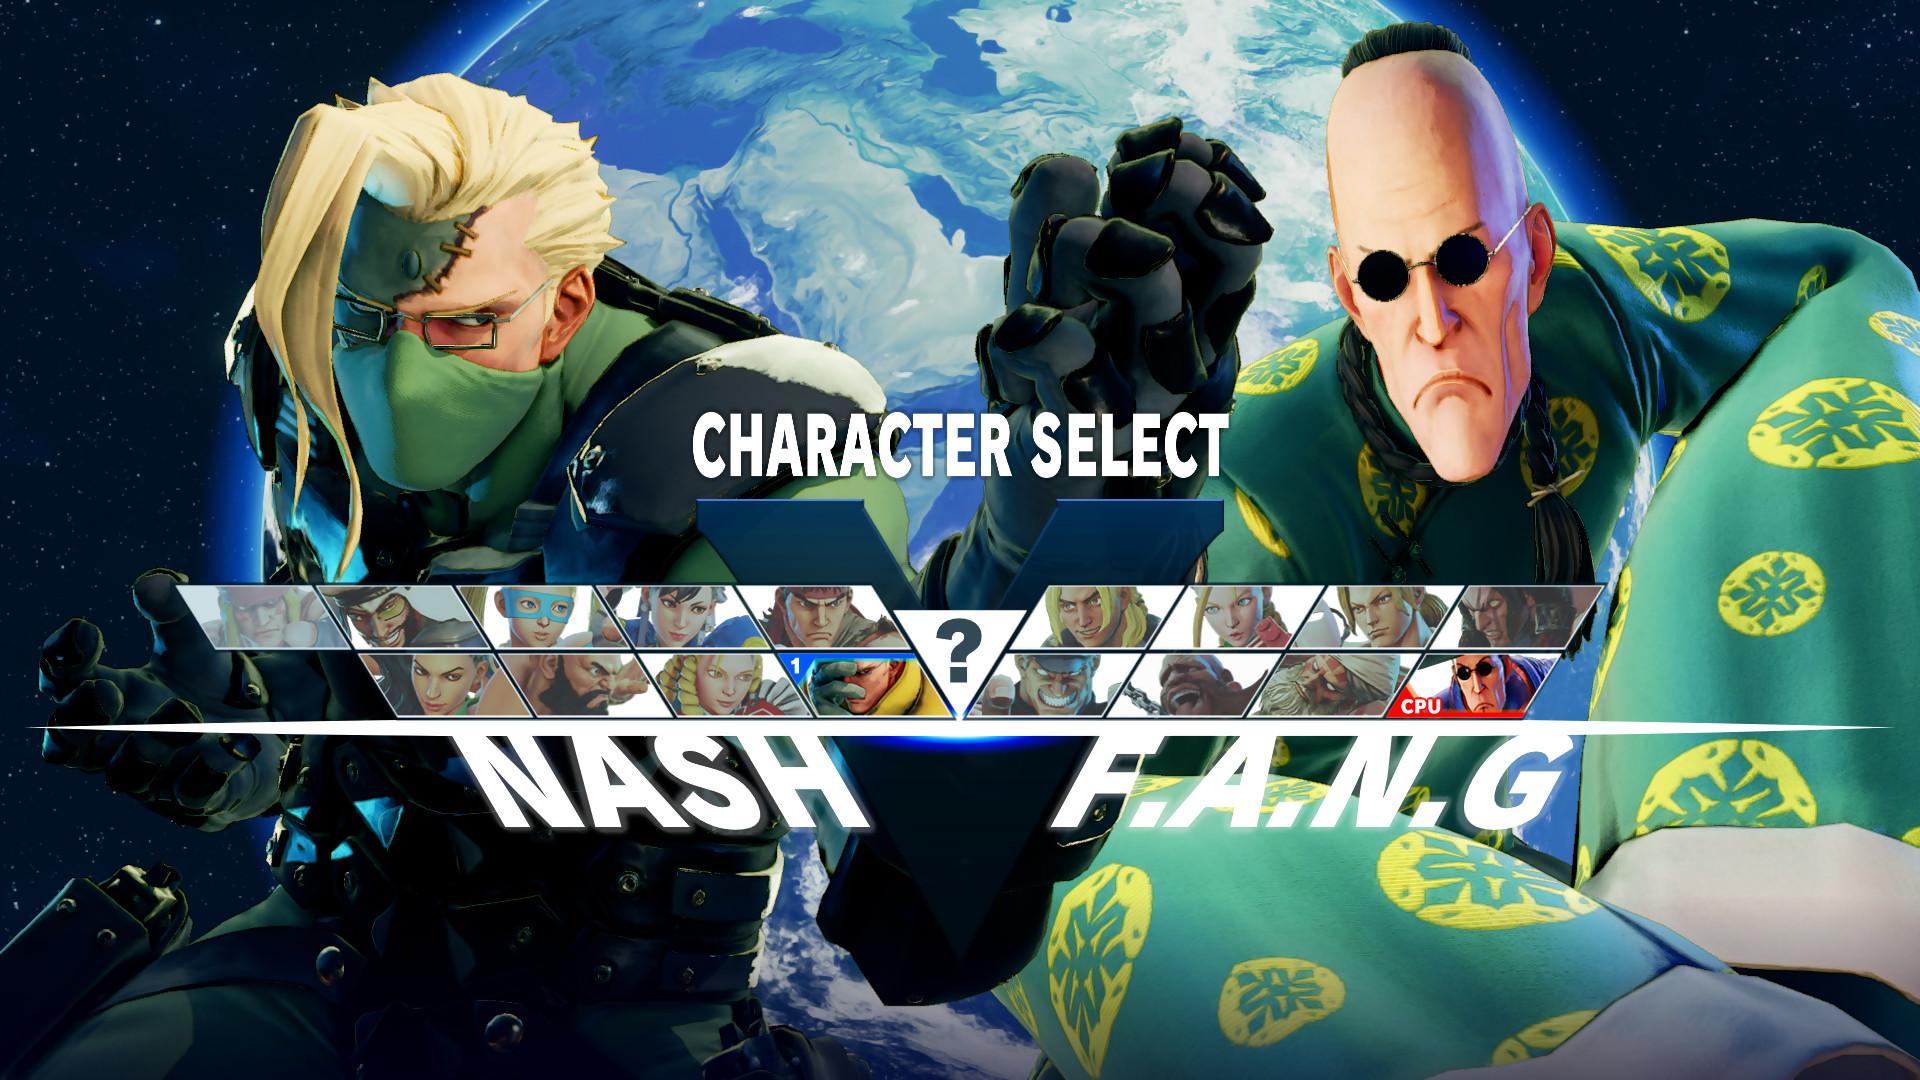 Le Messie revient ! Street Fighter V est annoncé  - Page 25 Street-fighter-5-56fae93ed77ee